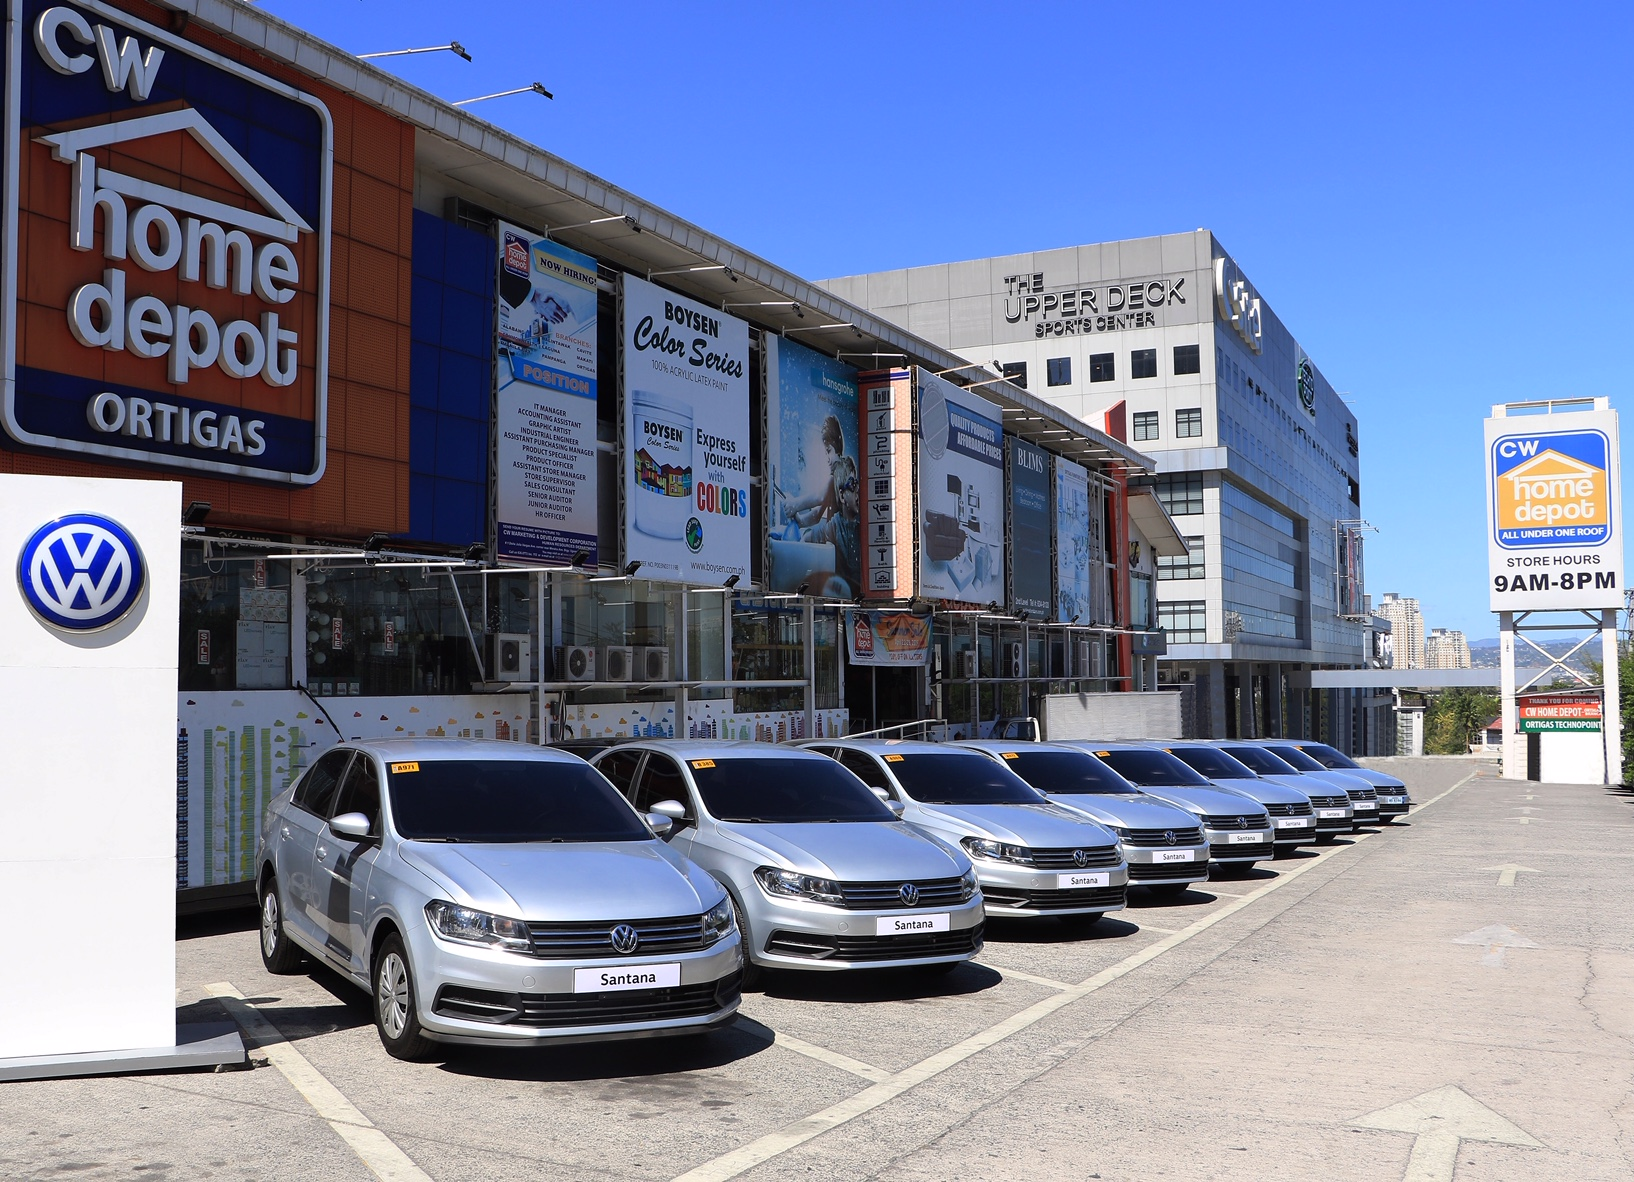 Cw Home Depot Orders More Vw Santana Sedans